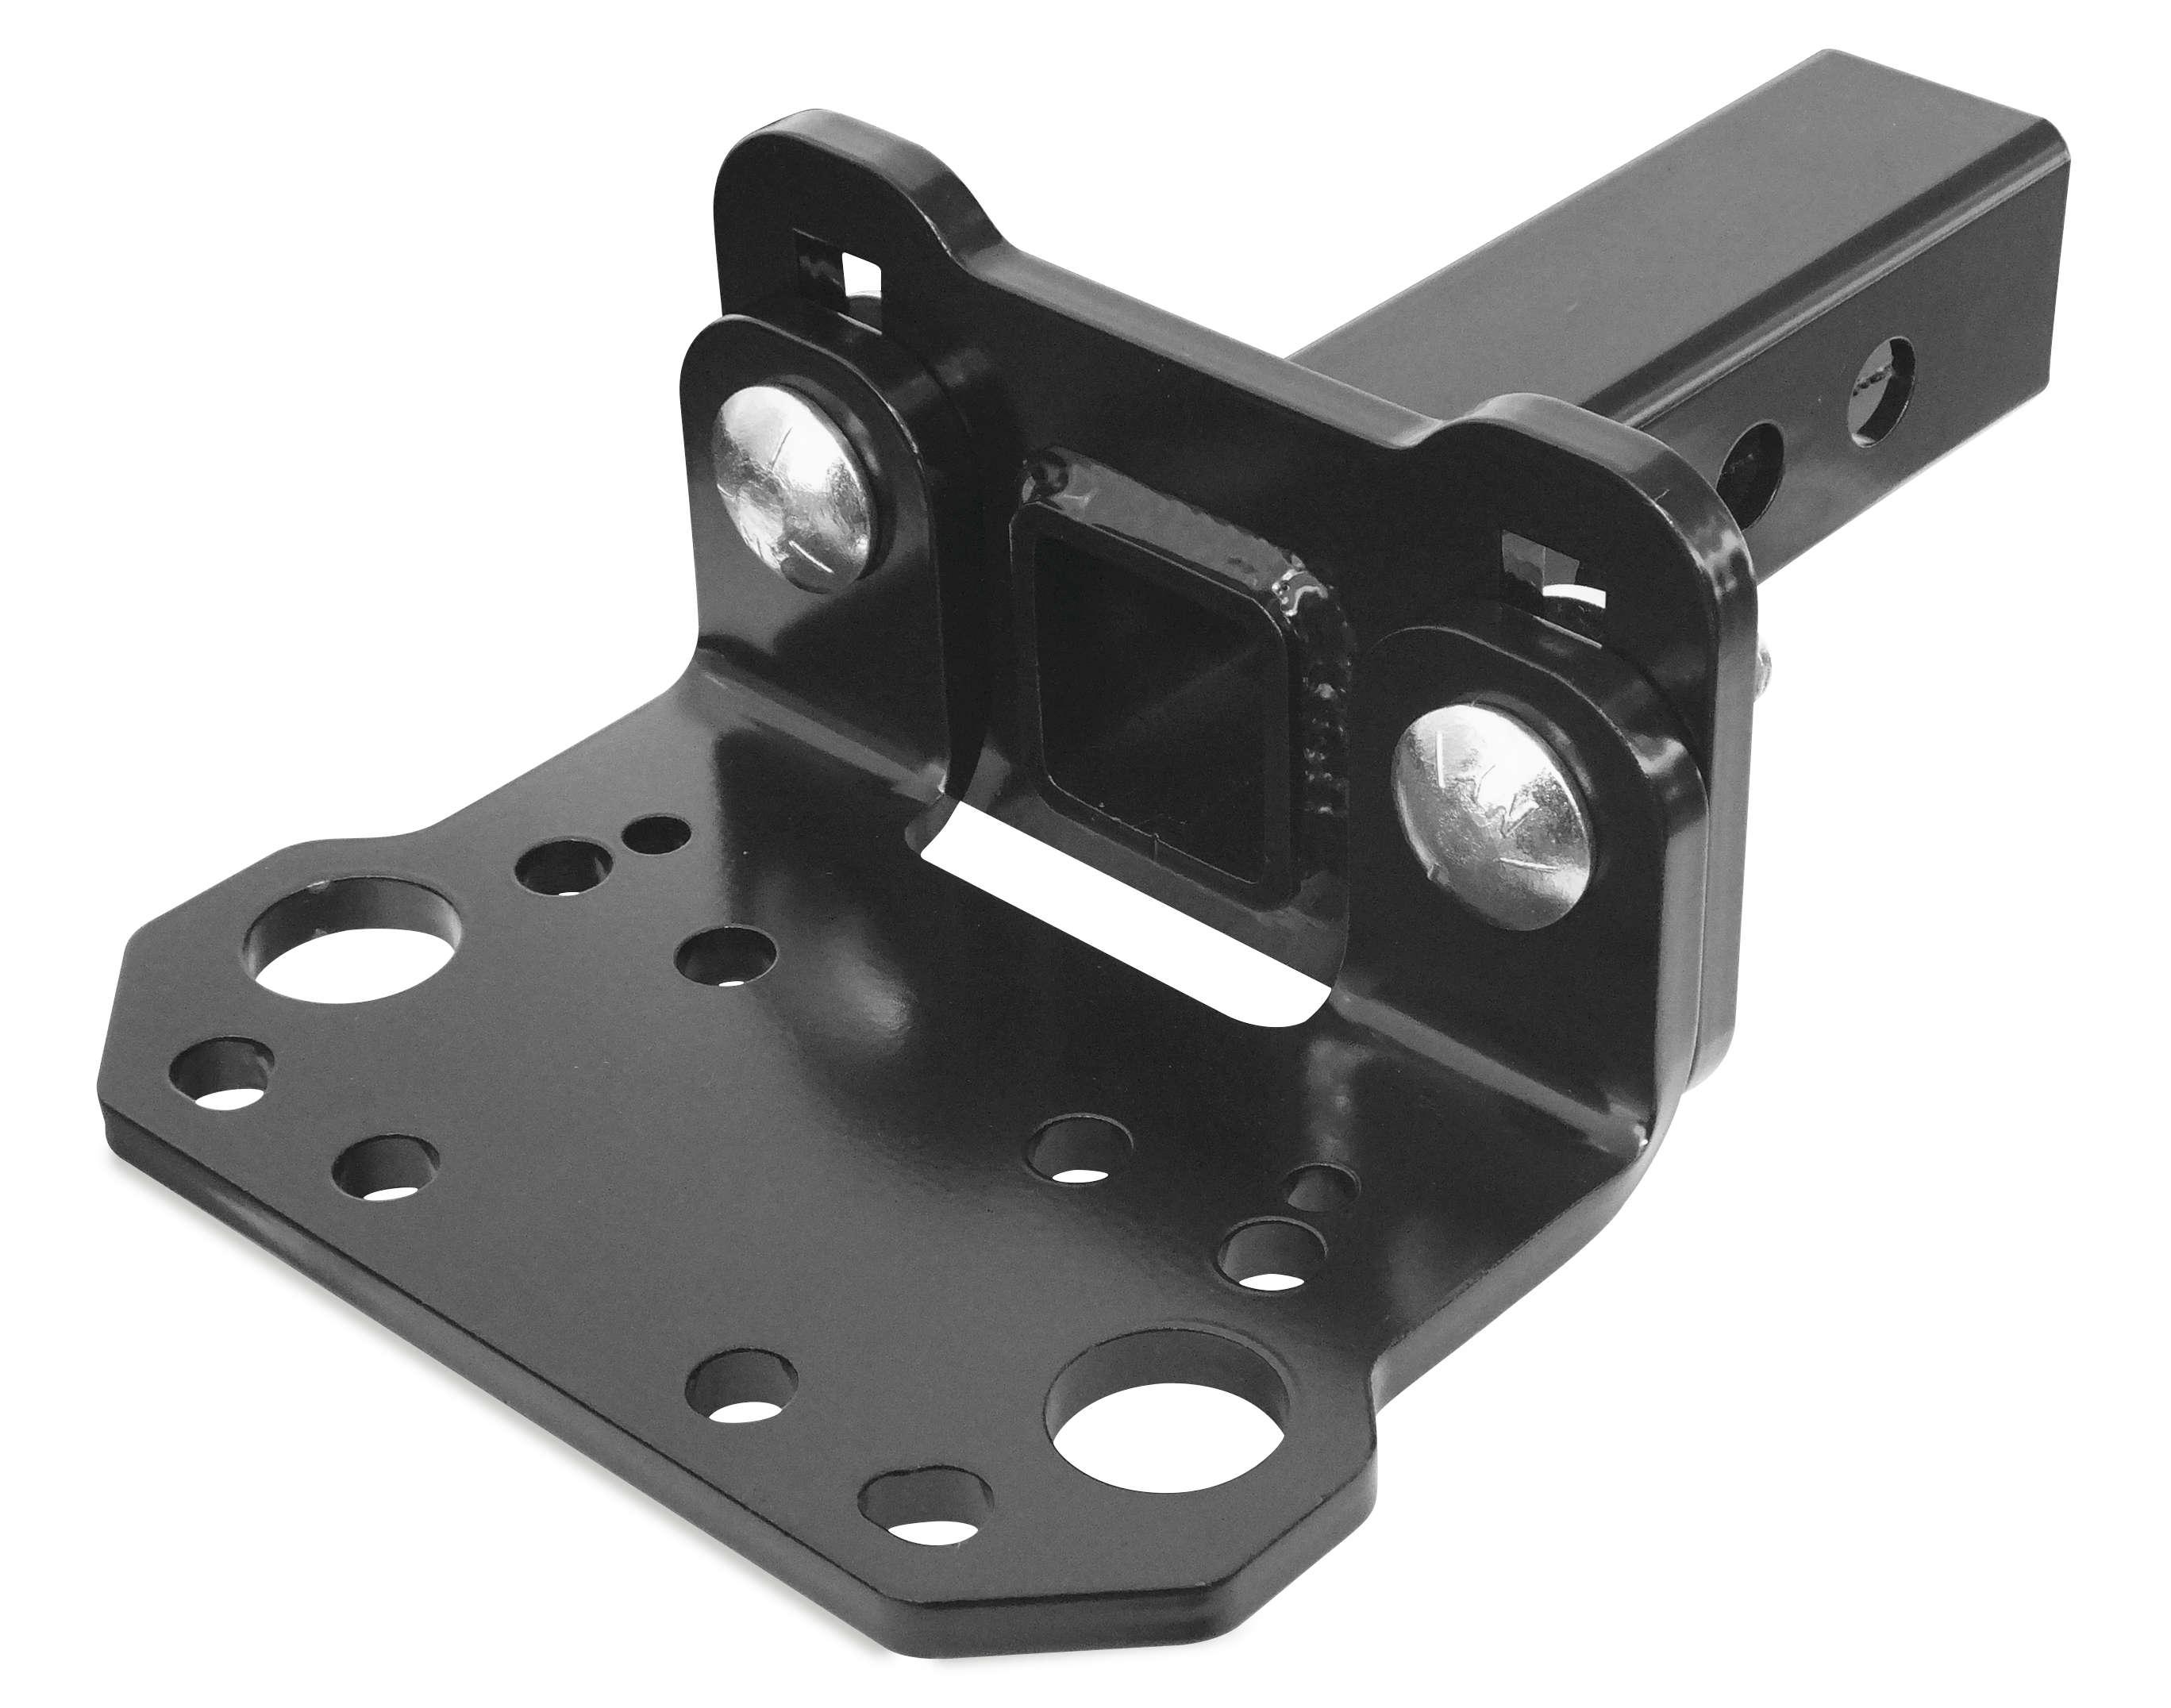 Tiger Tail Pin Hitch Adaptor Ball KFI Products 101140 TigerTail